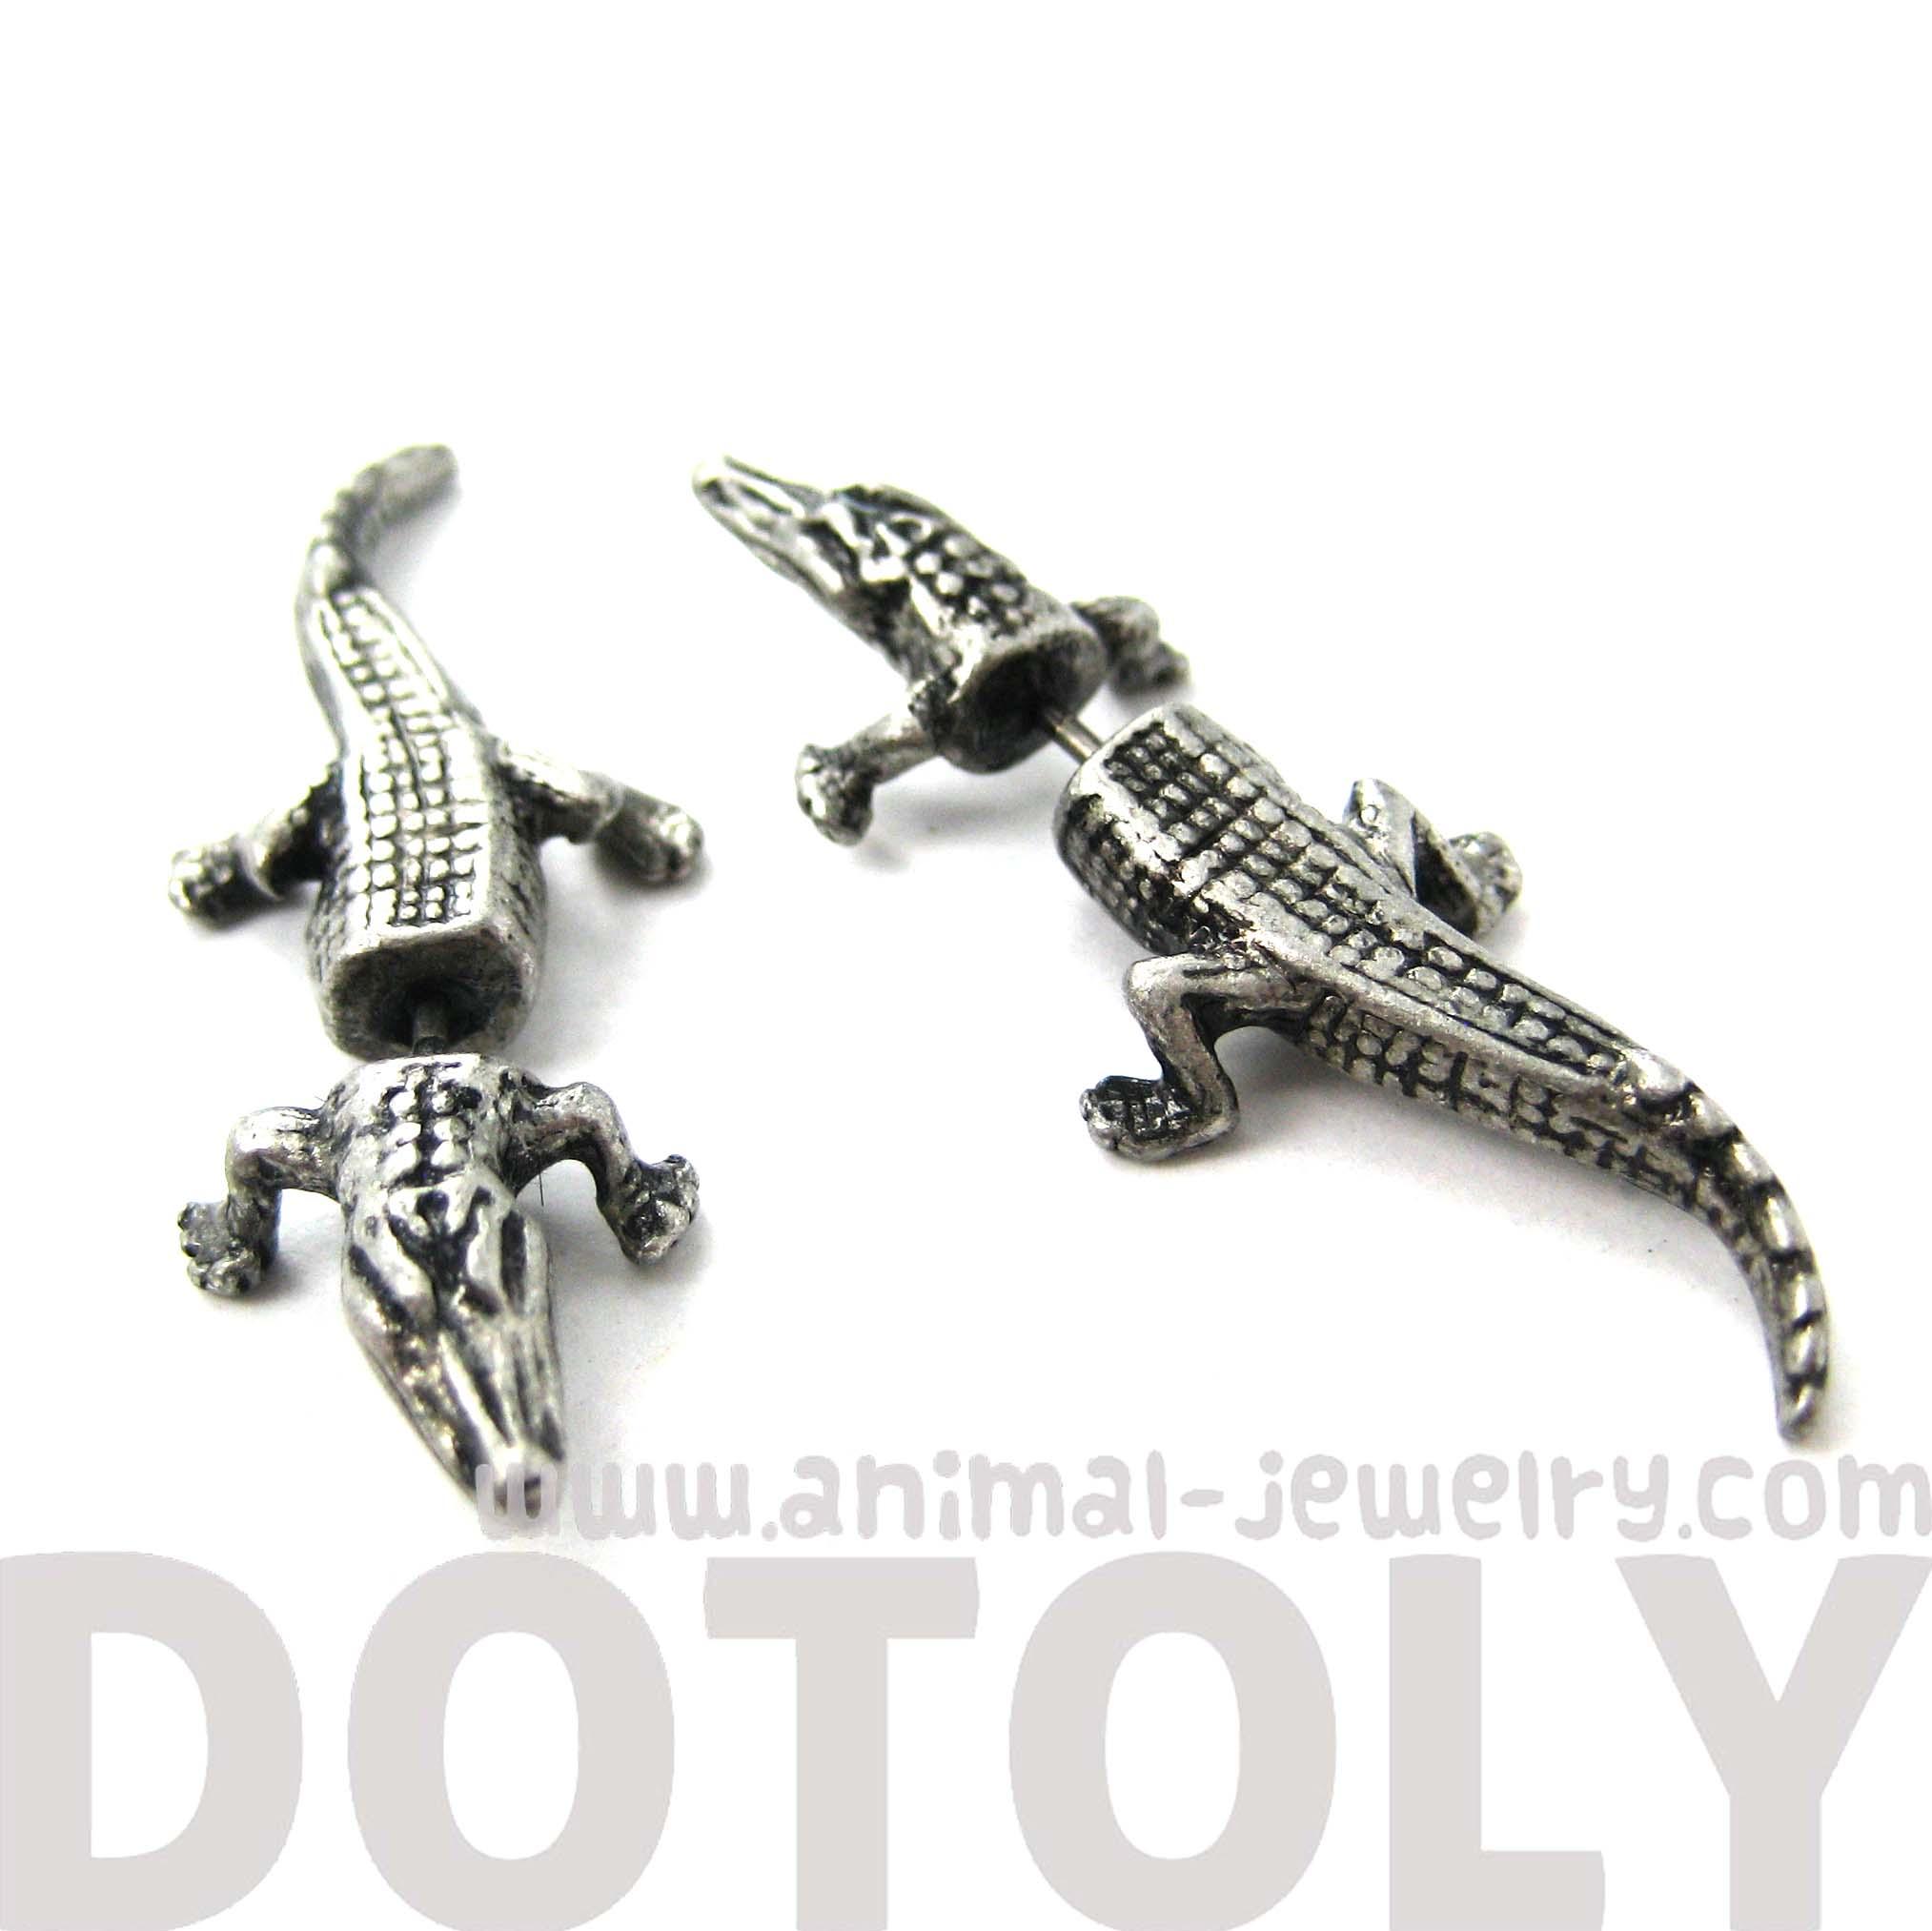 Fake Gauge Crocodile Alligator Animal Stud Earrings In Silver   Thumbnail 2